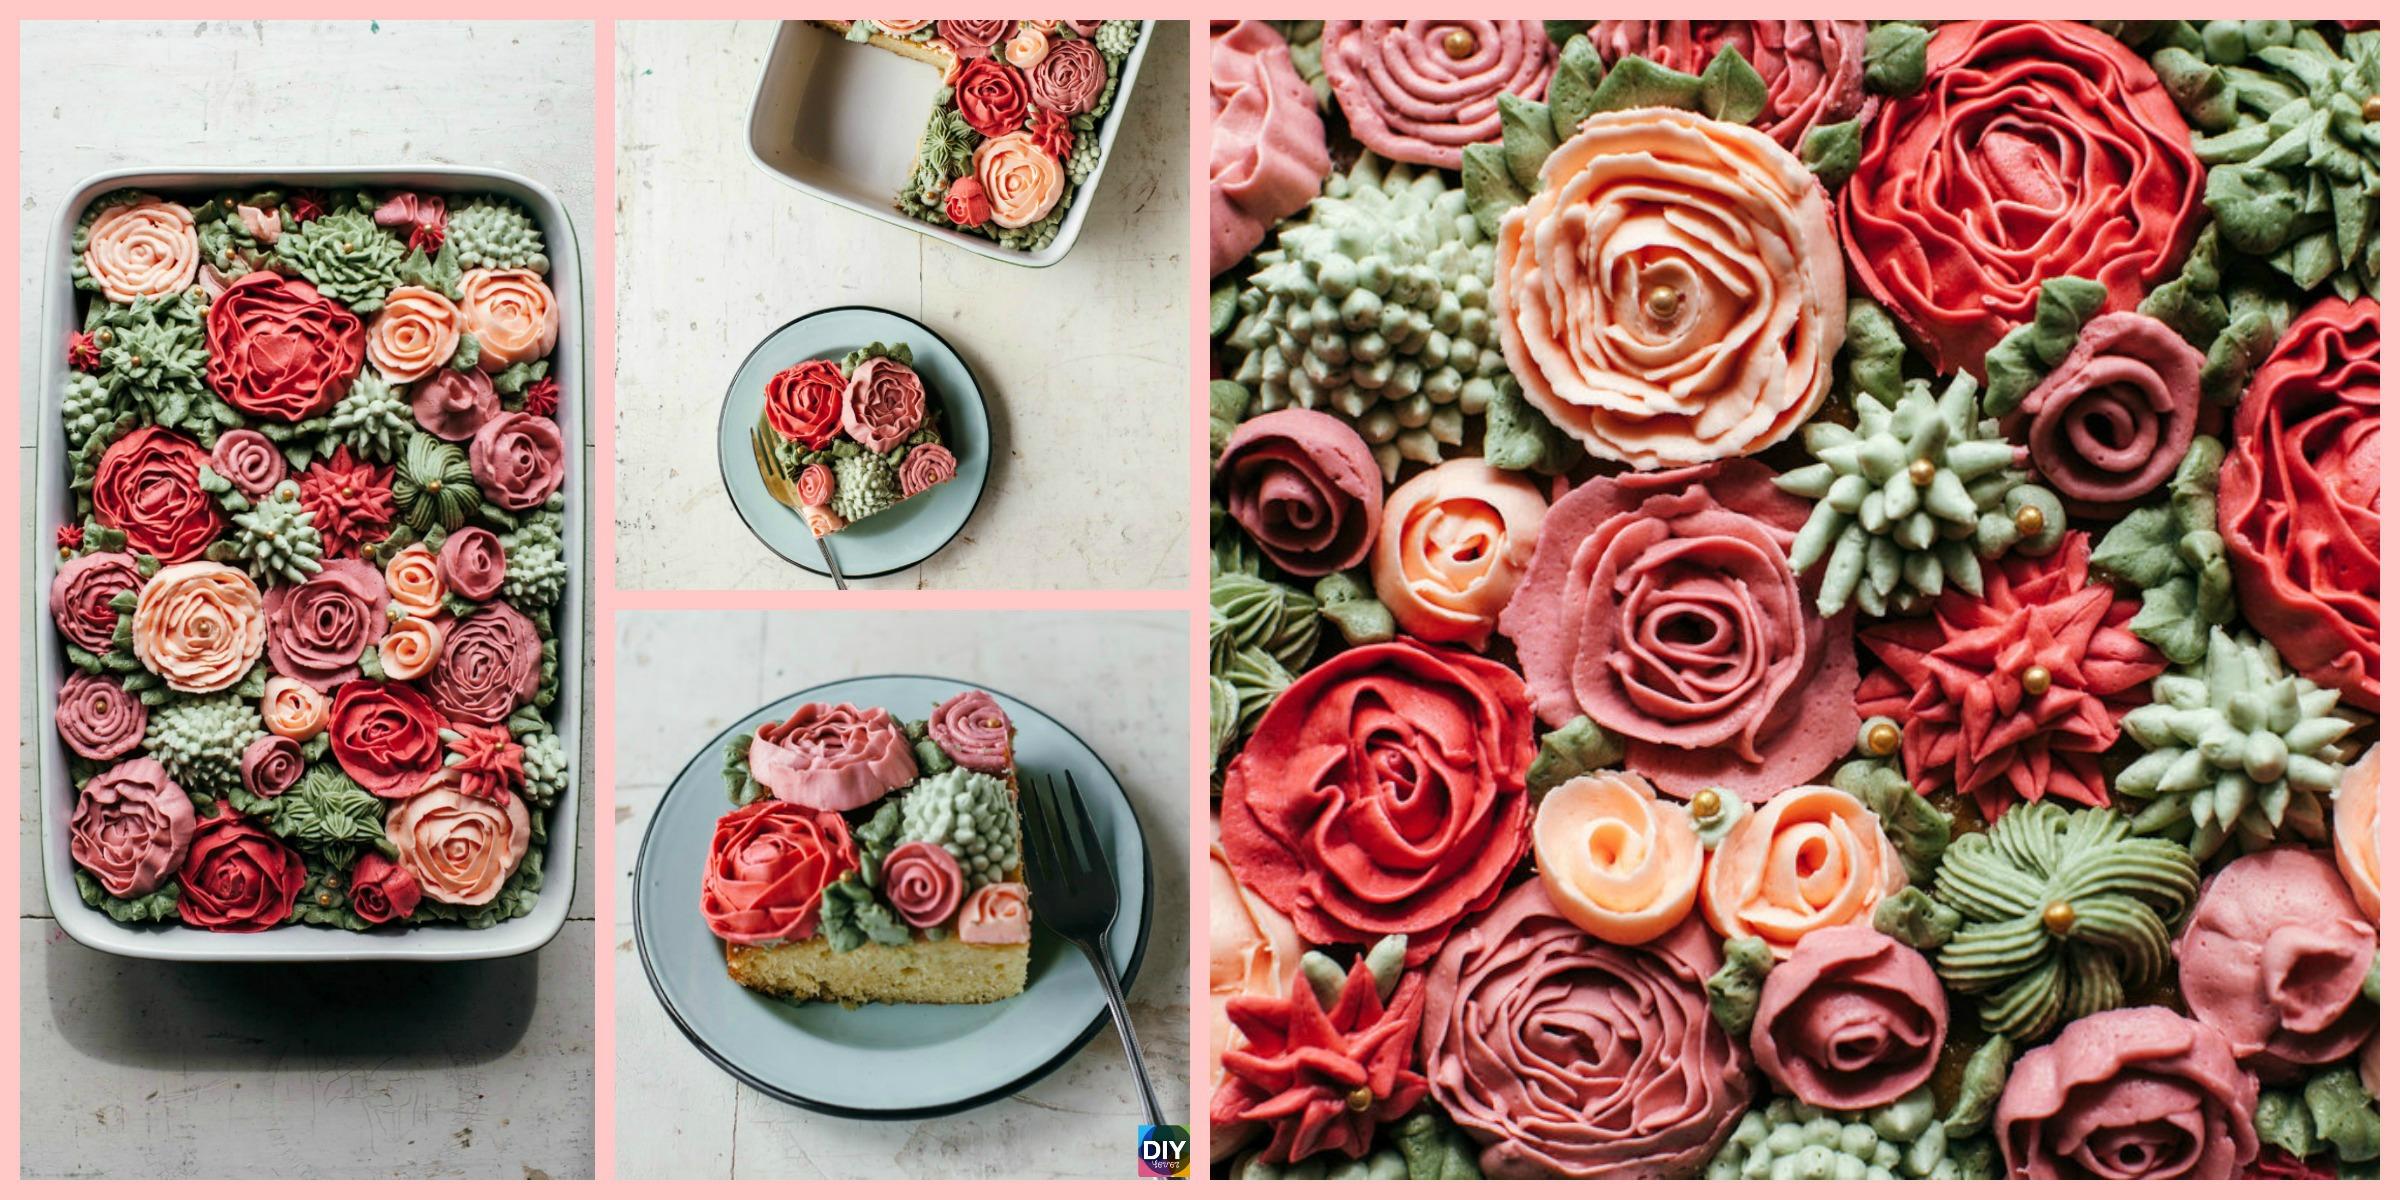 Amazing DIY Rose Cake – Step by Step Tutorial